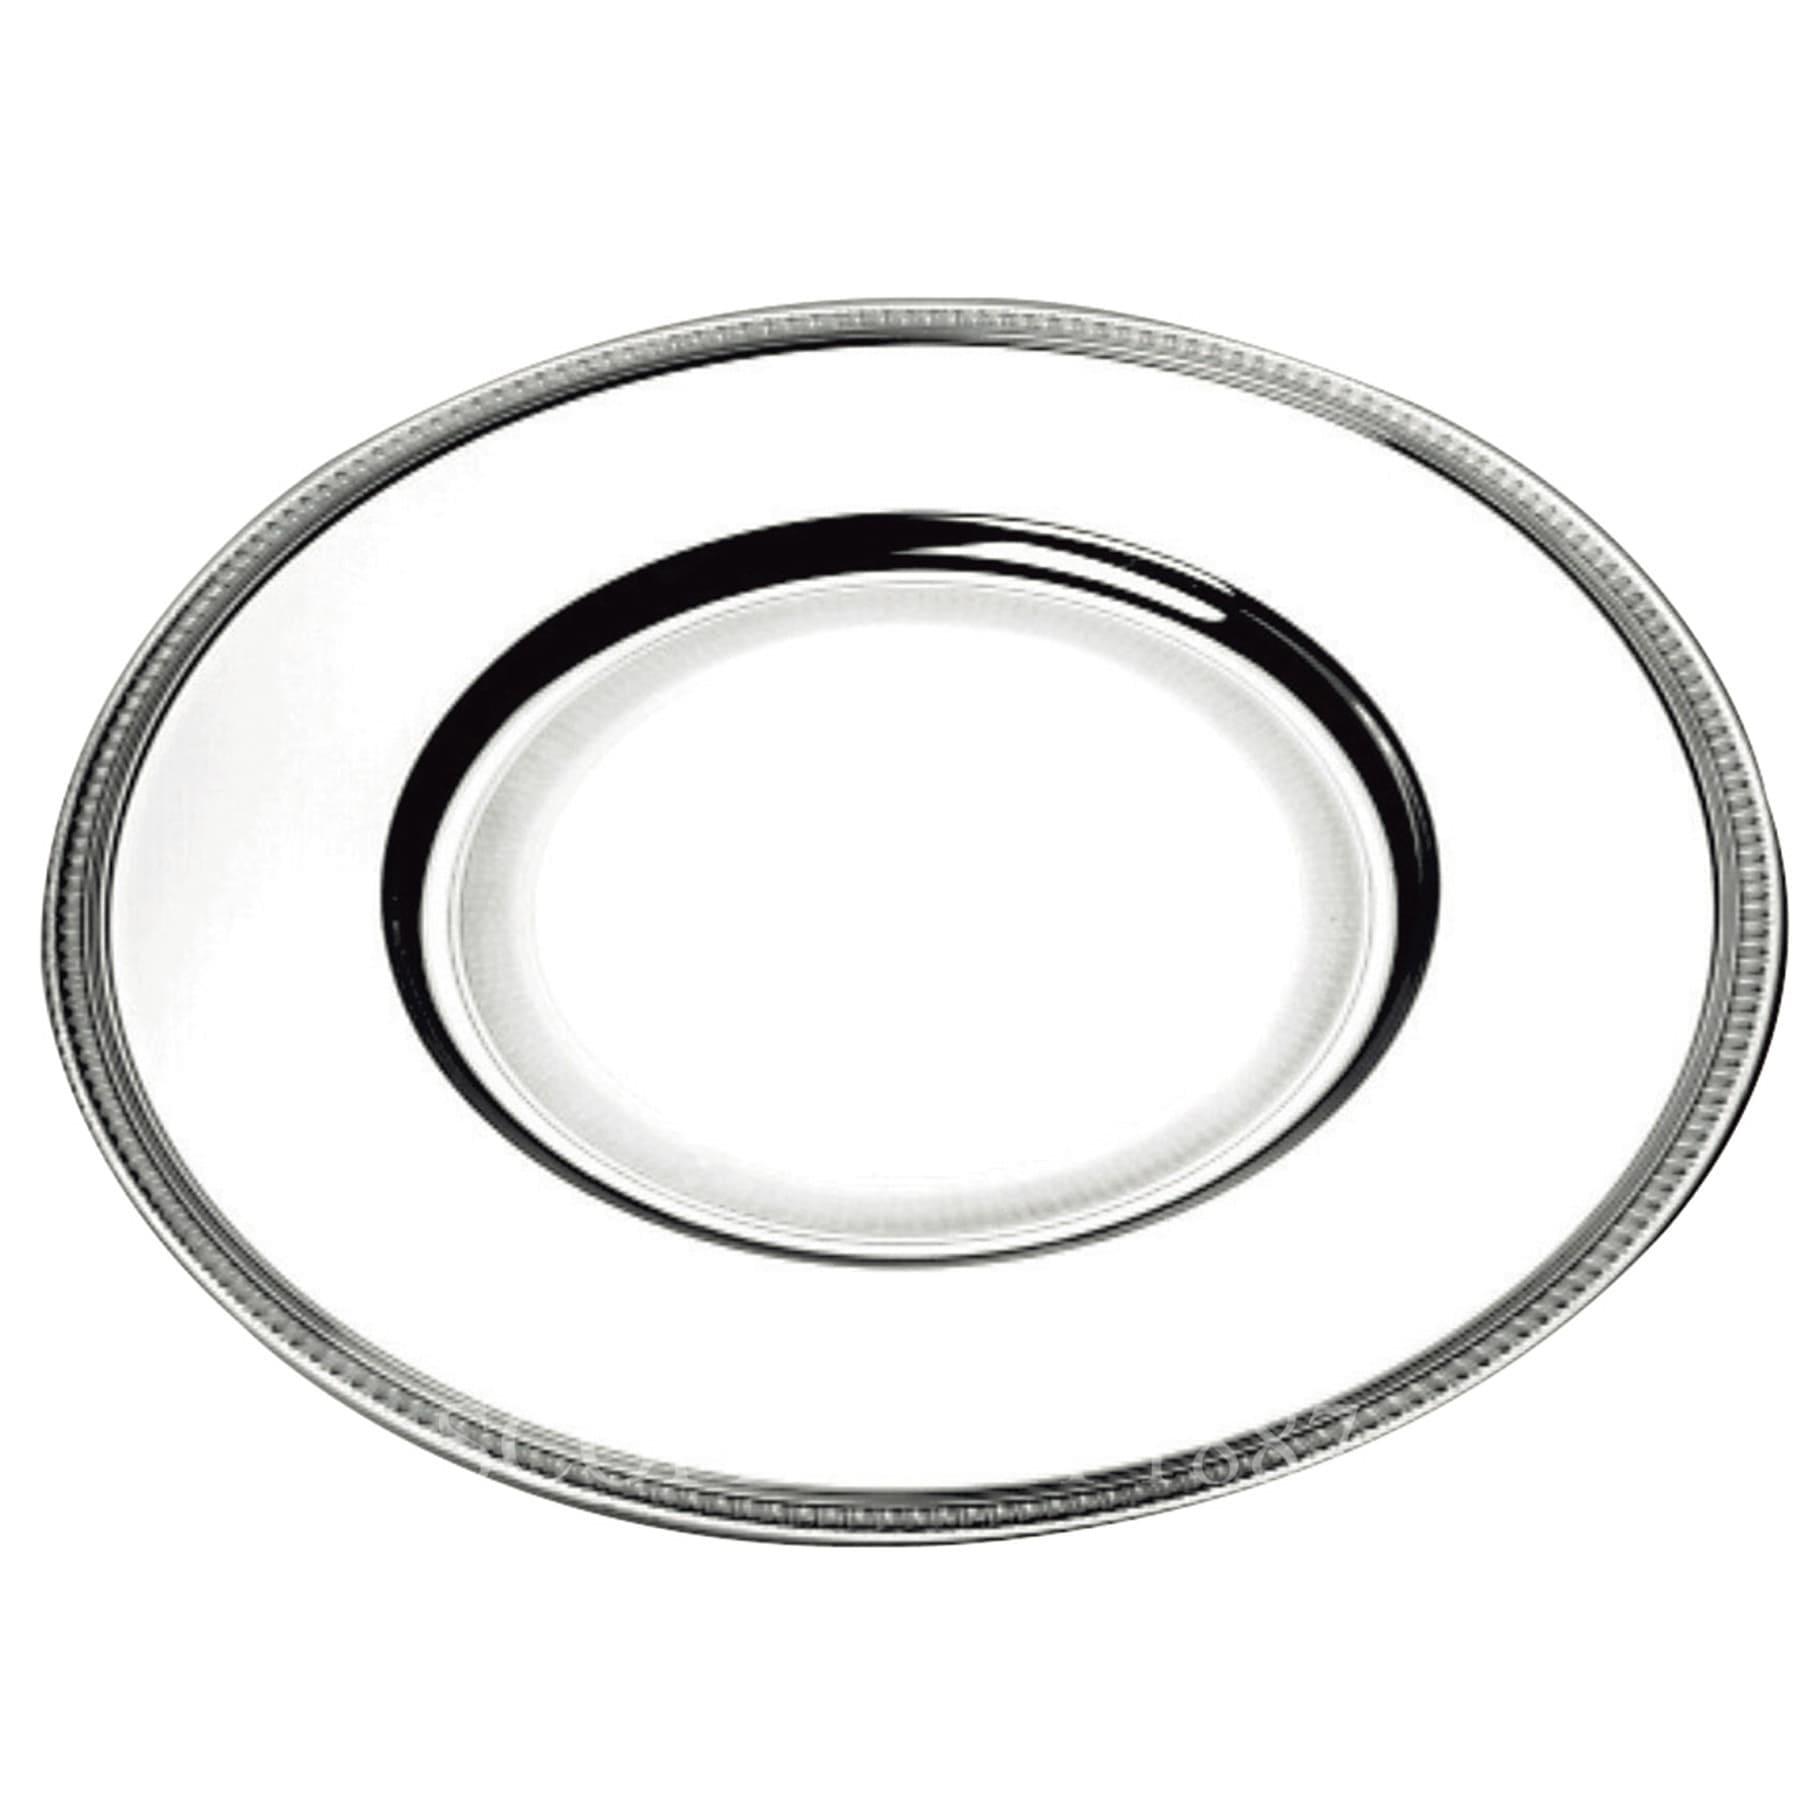 christofle silver plated malmaison charger presentation plate